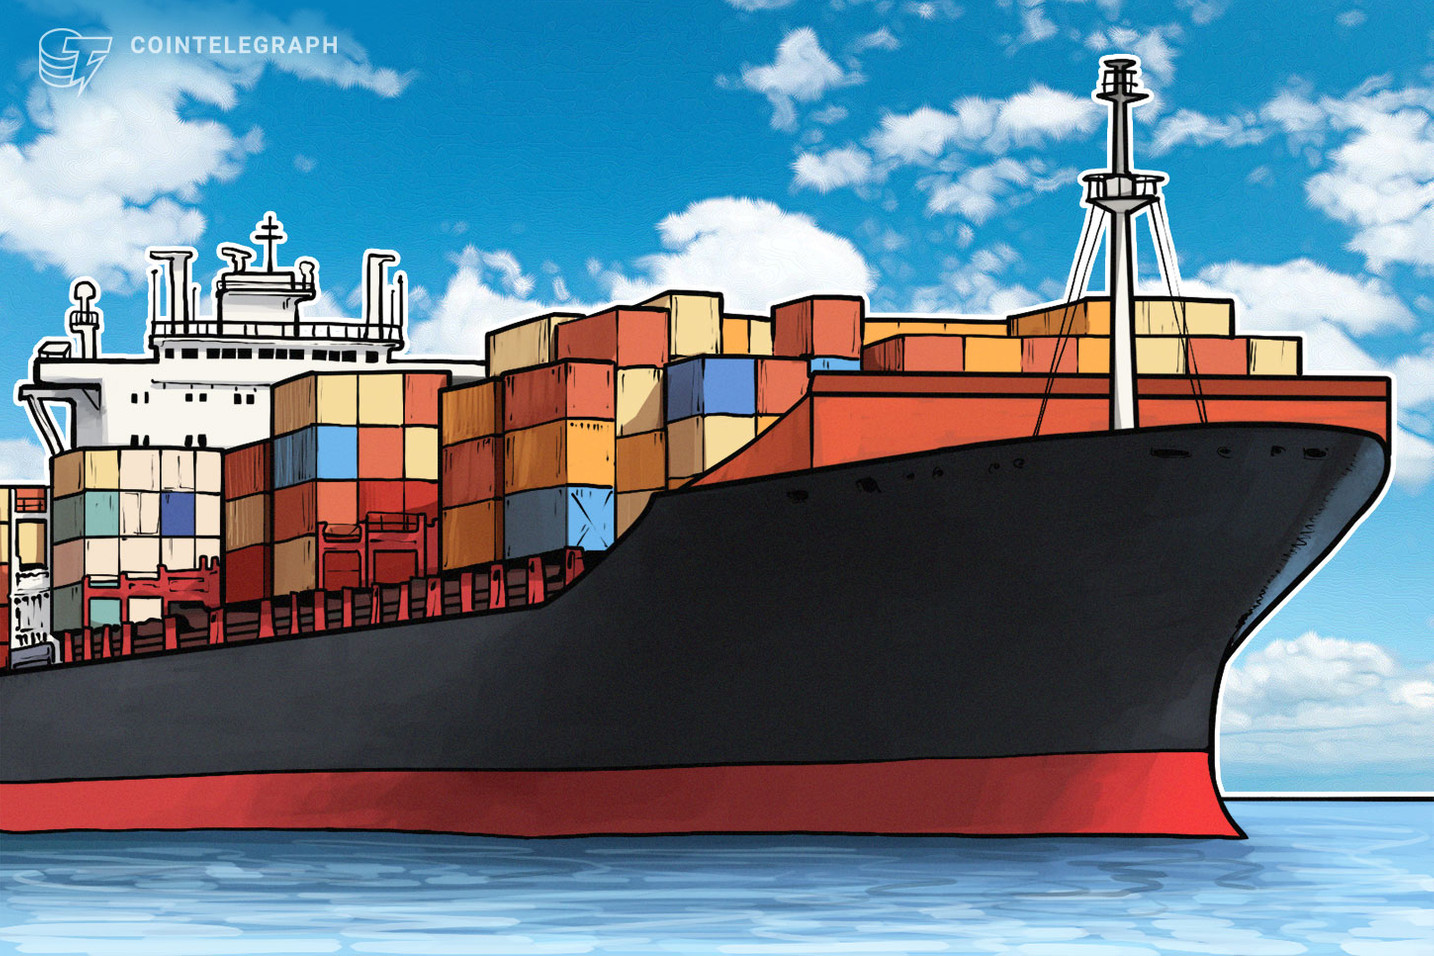 Leading UK Port Operator Seeks to Improve Shipping Logistics via Blockchain